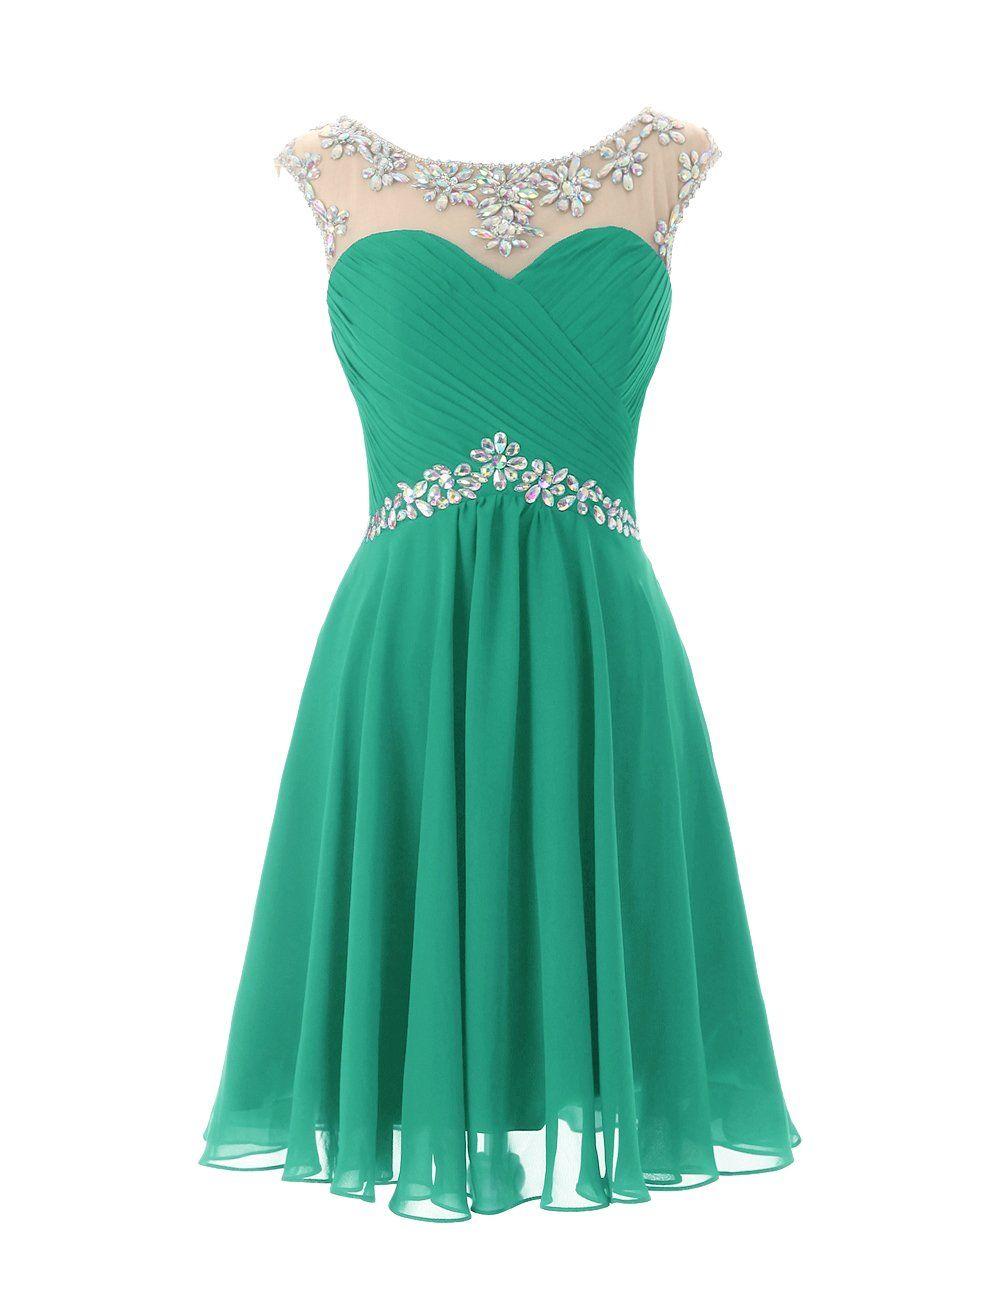 Dresstells short prom dresses sexy homecoming dress for juniors